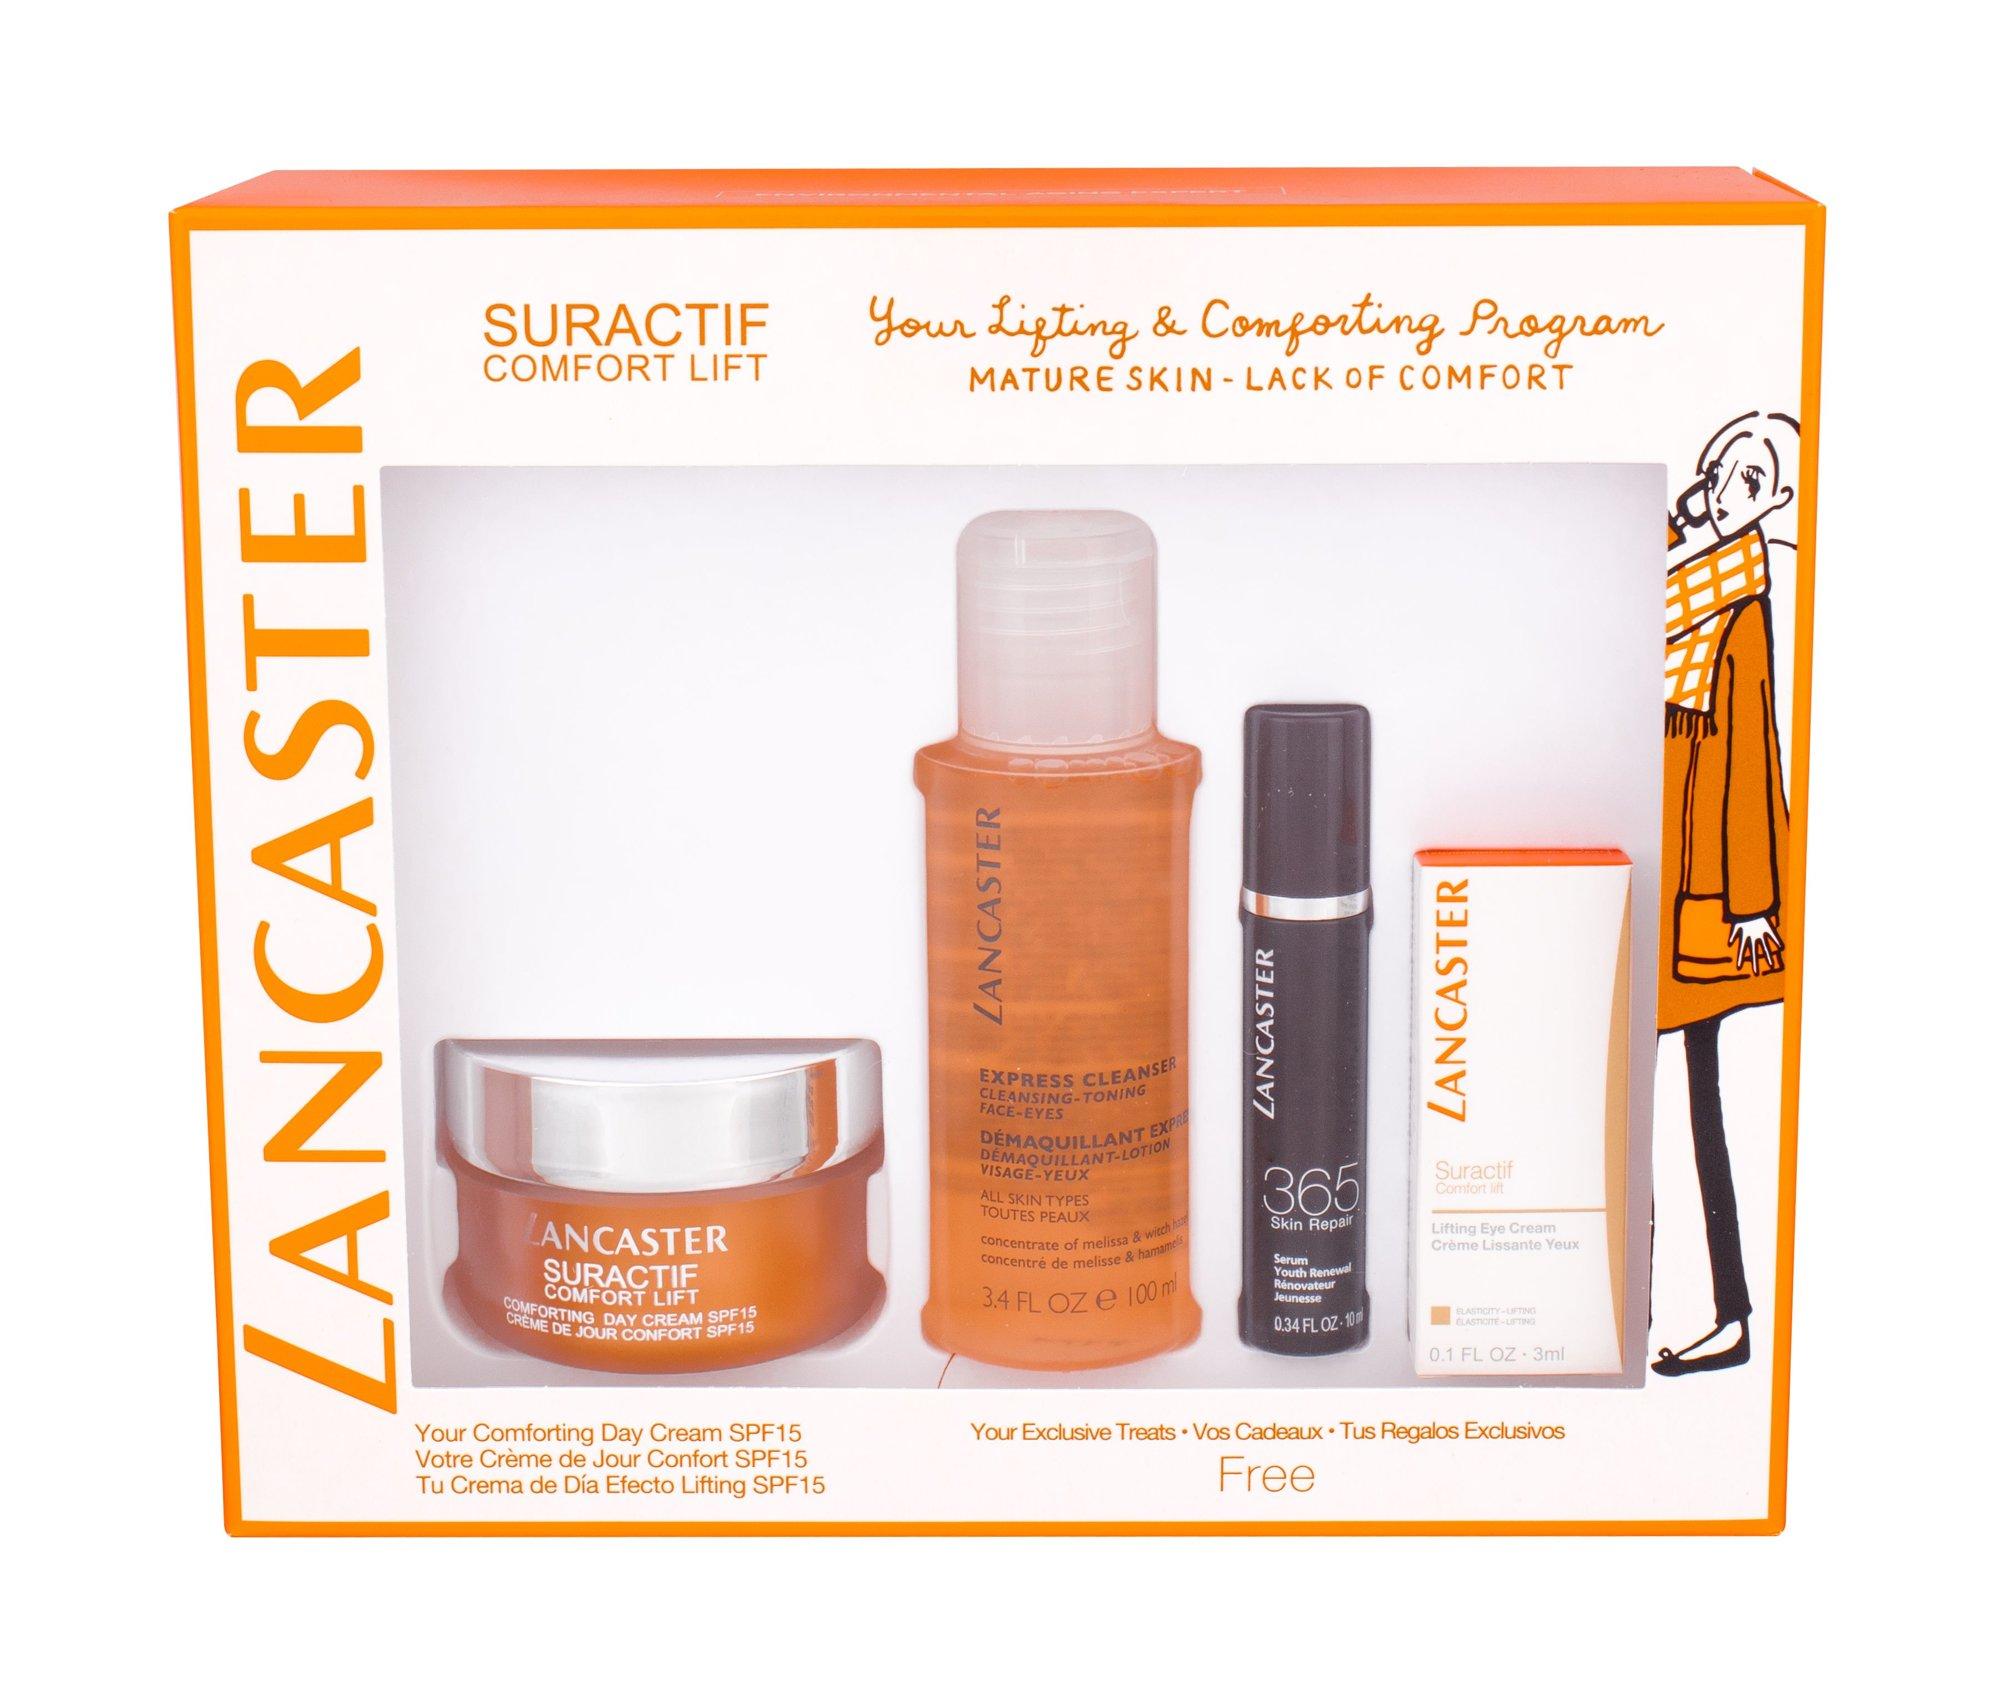 Lancaster Suractif Comfort Lift Kit Cosmetic 50ml